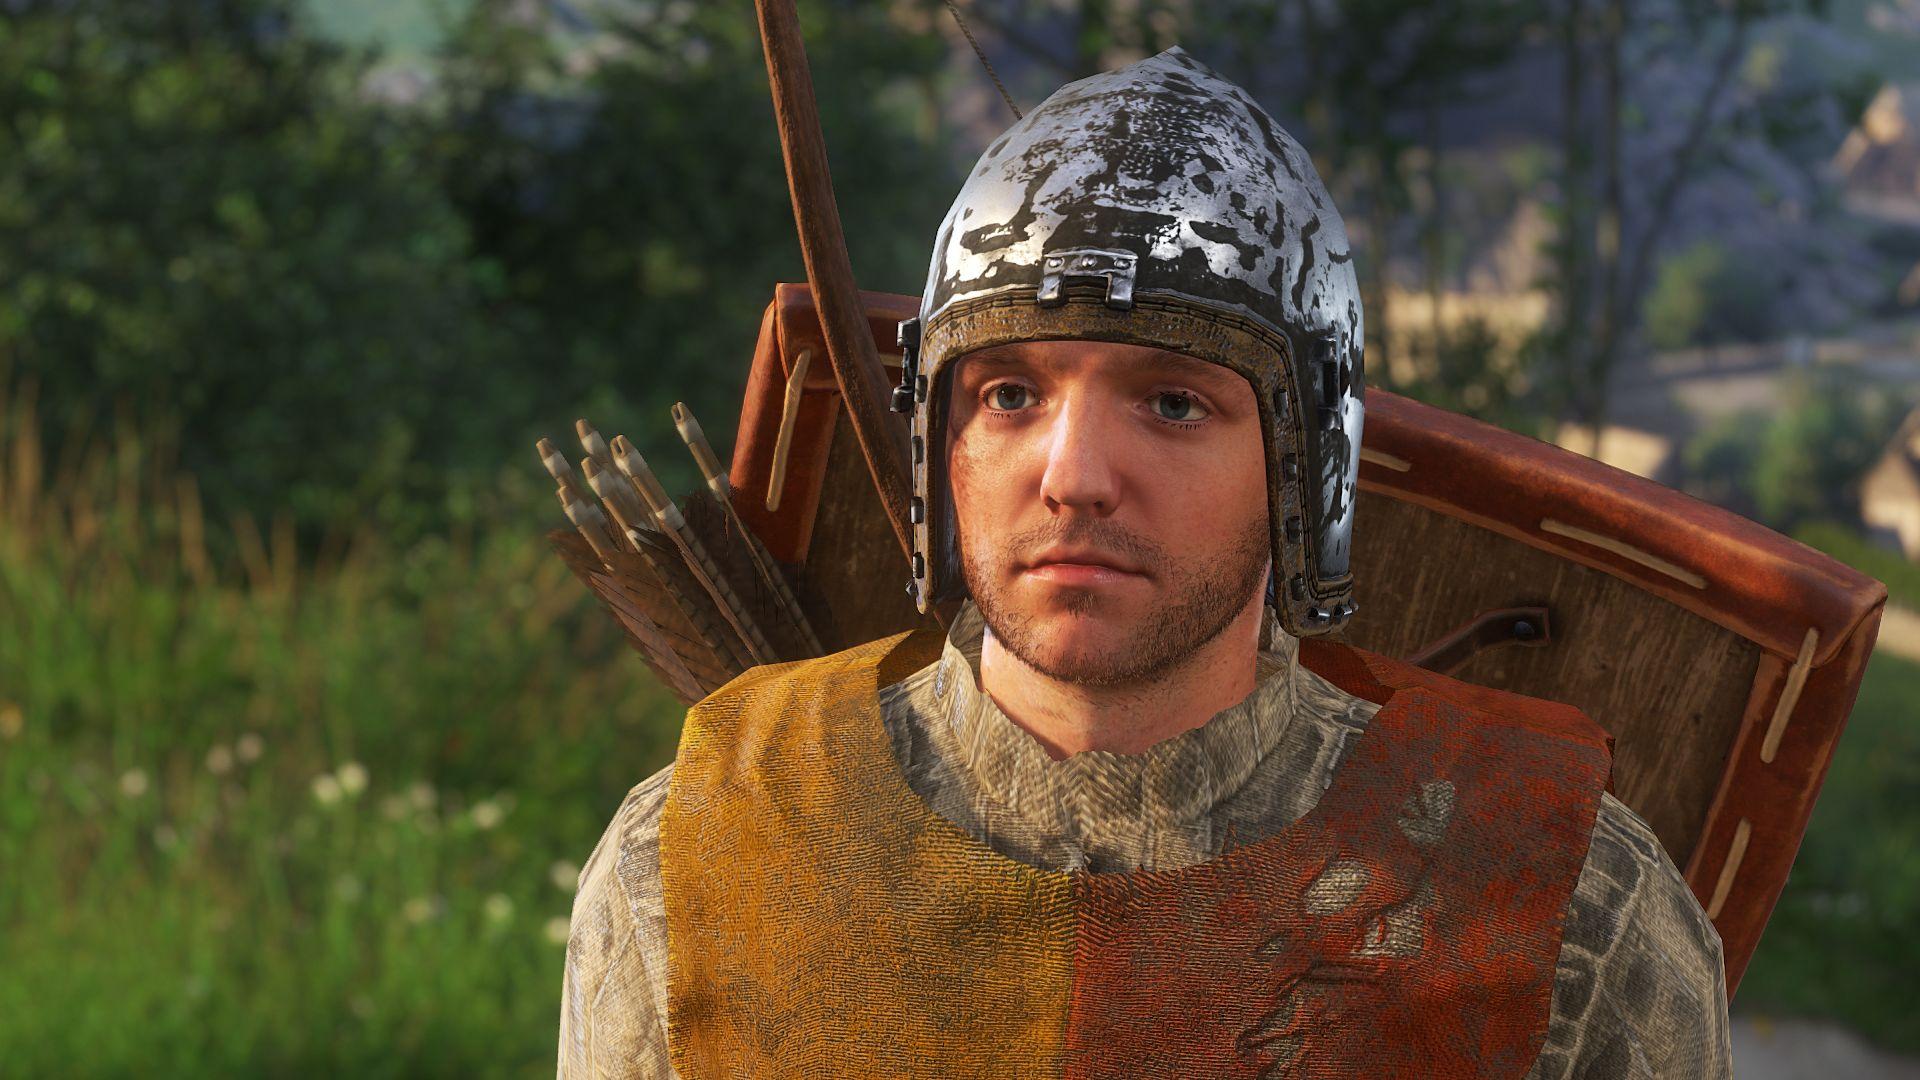 Лучшие ролевые игры - Kingdom Come: Deliverance